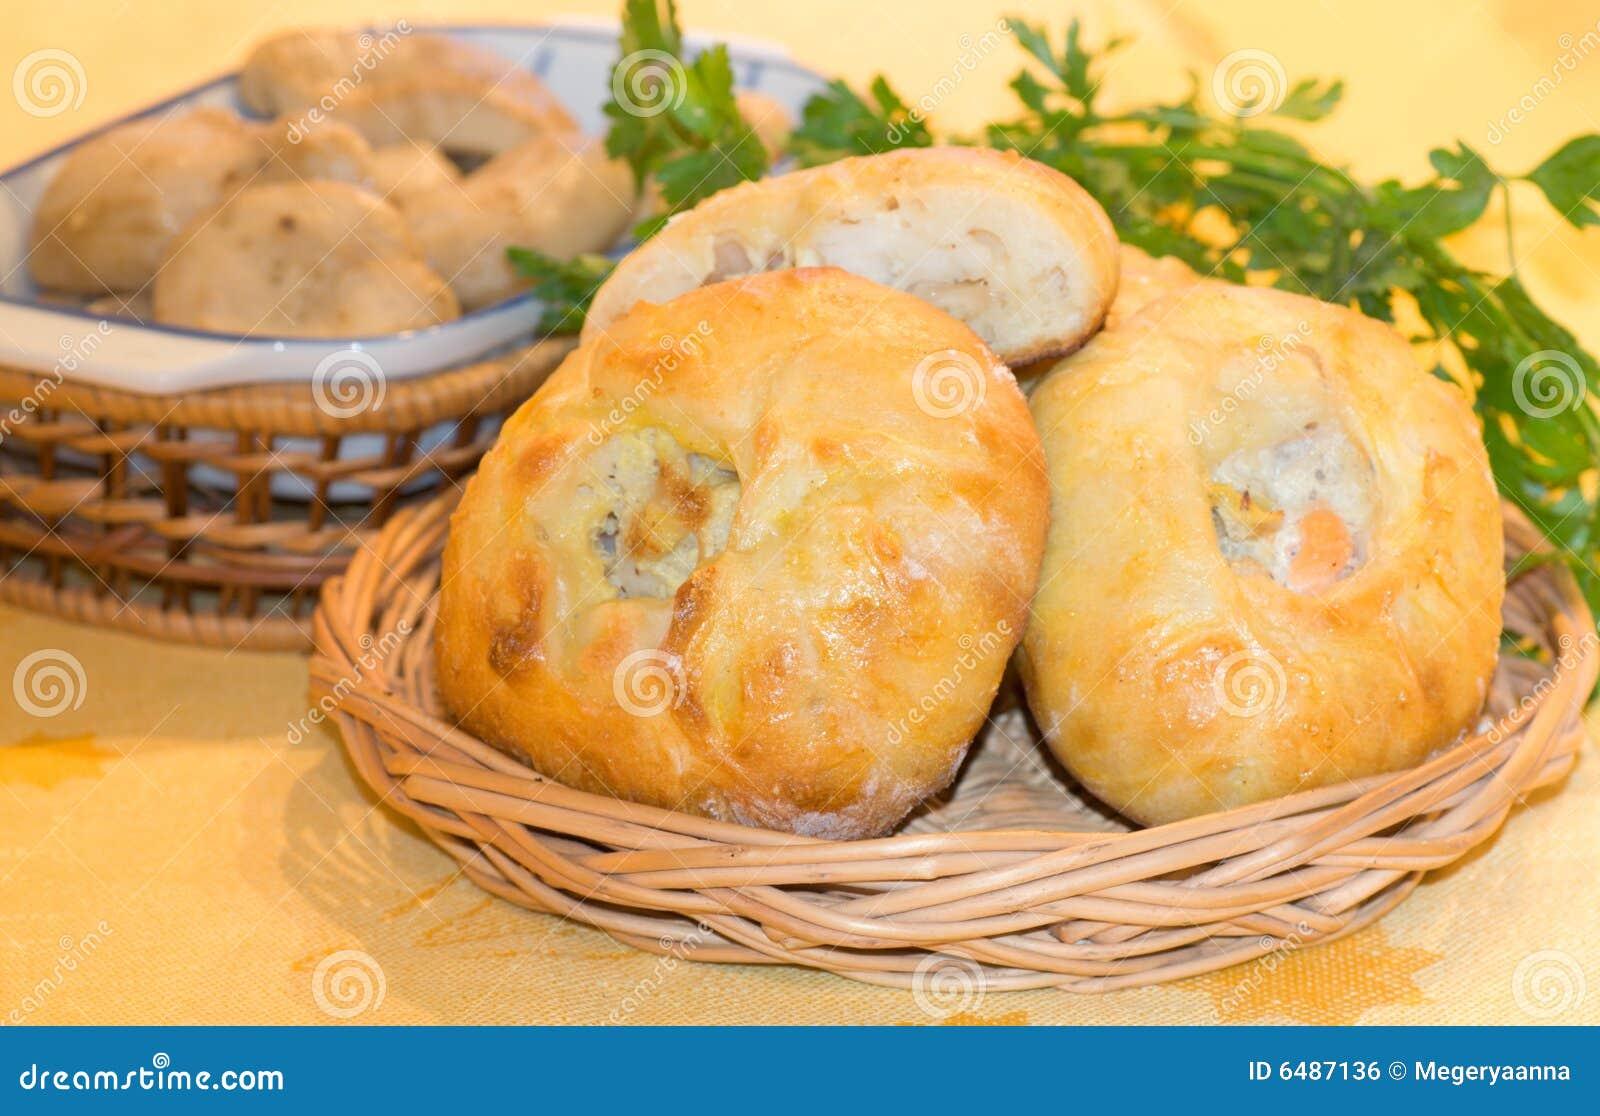 russische küche, lizenzfreies stockbild - bild: 6487136